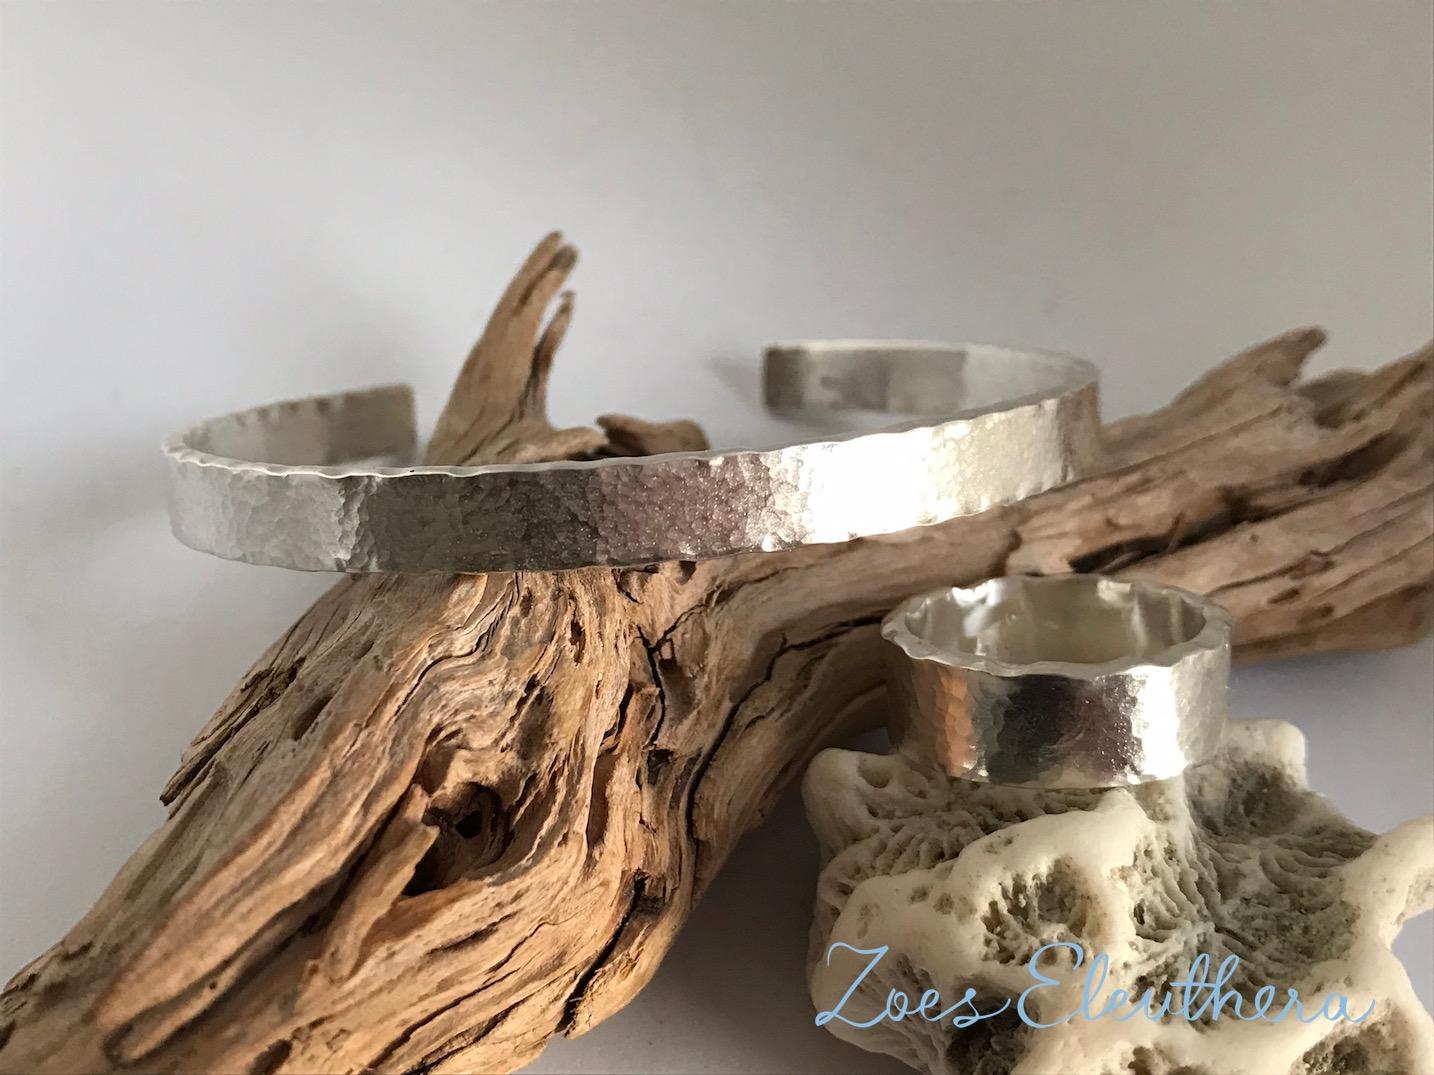 Armreif Ring Silber Set Welle Hammerschlag